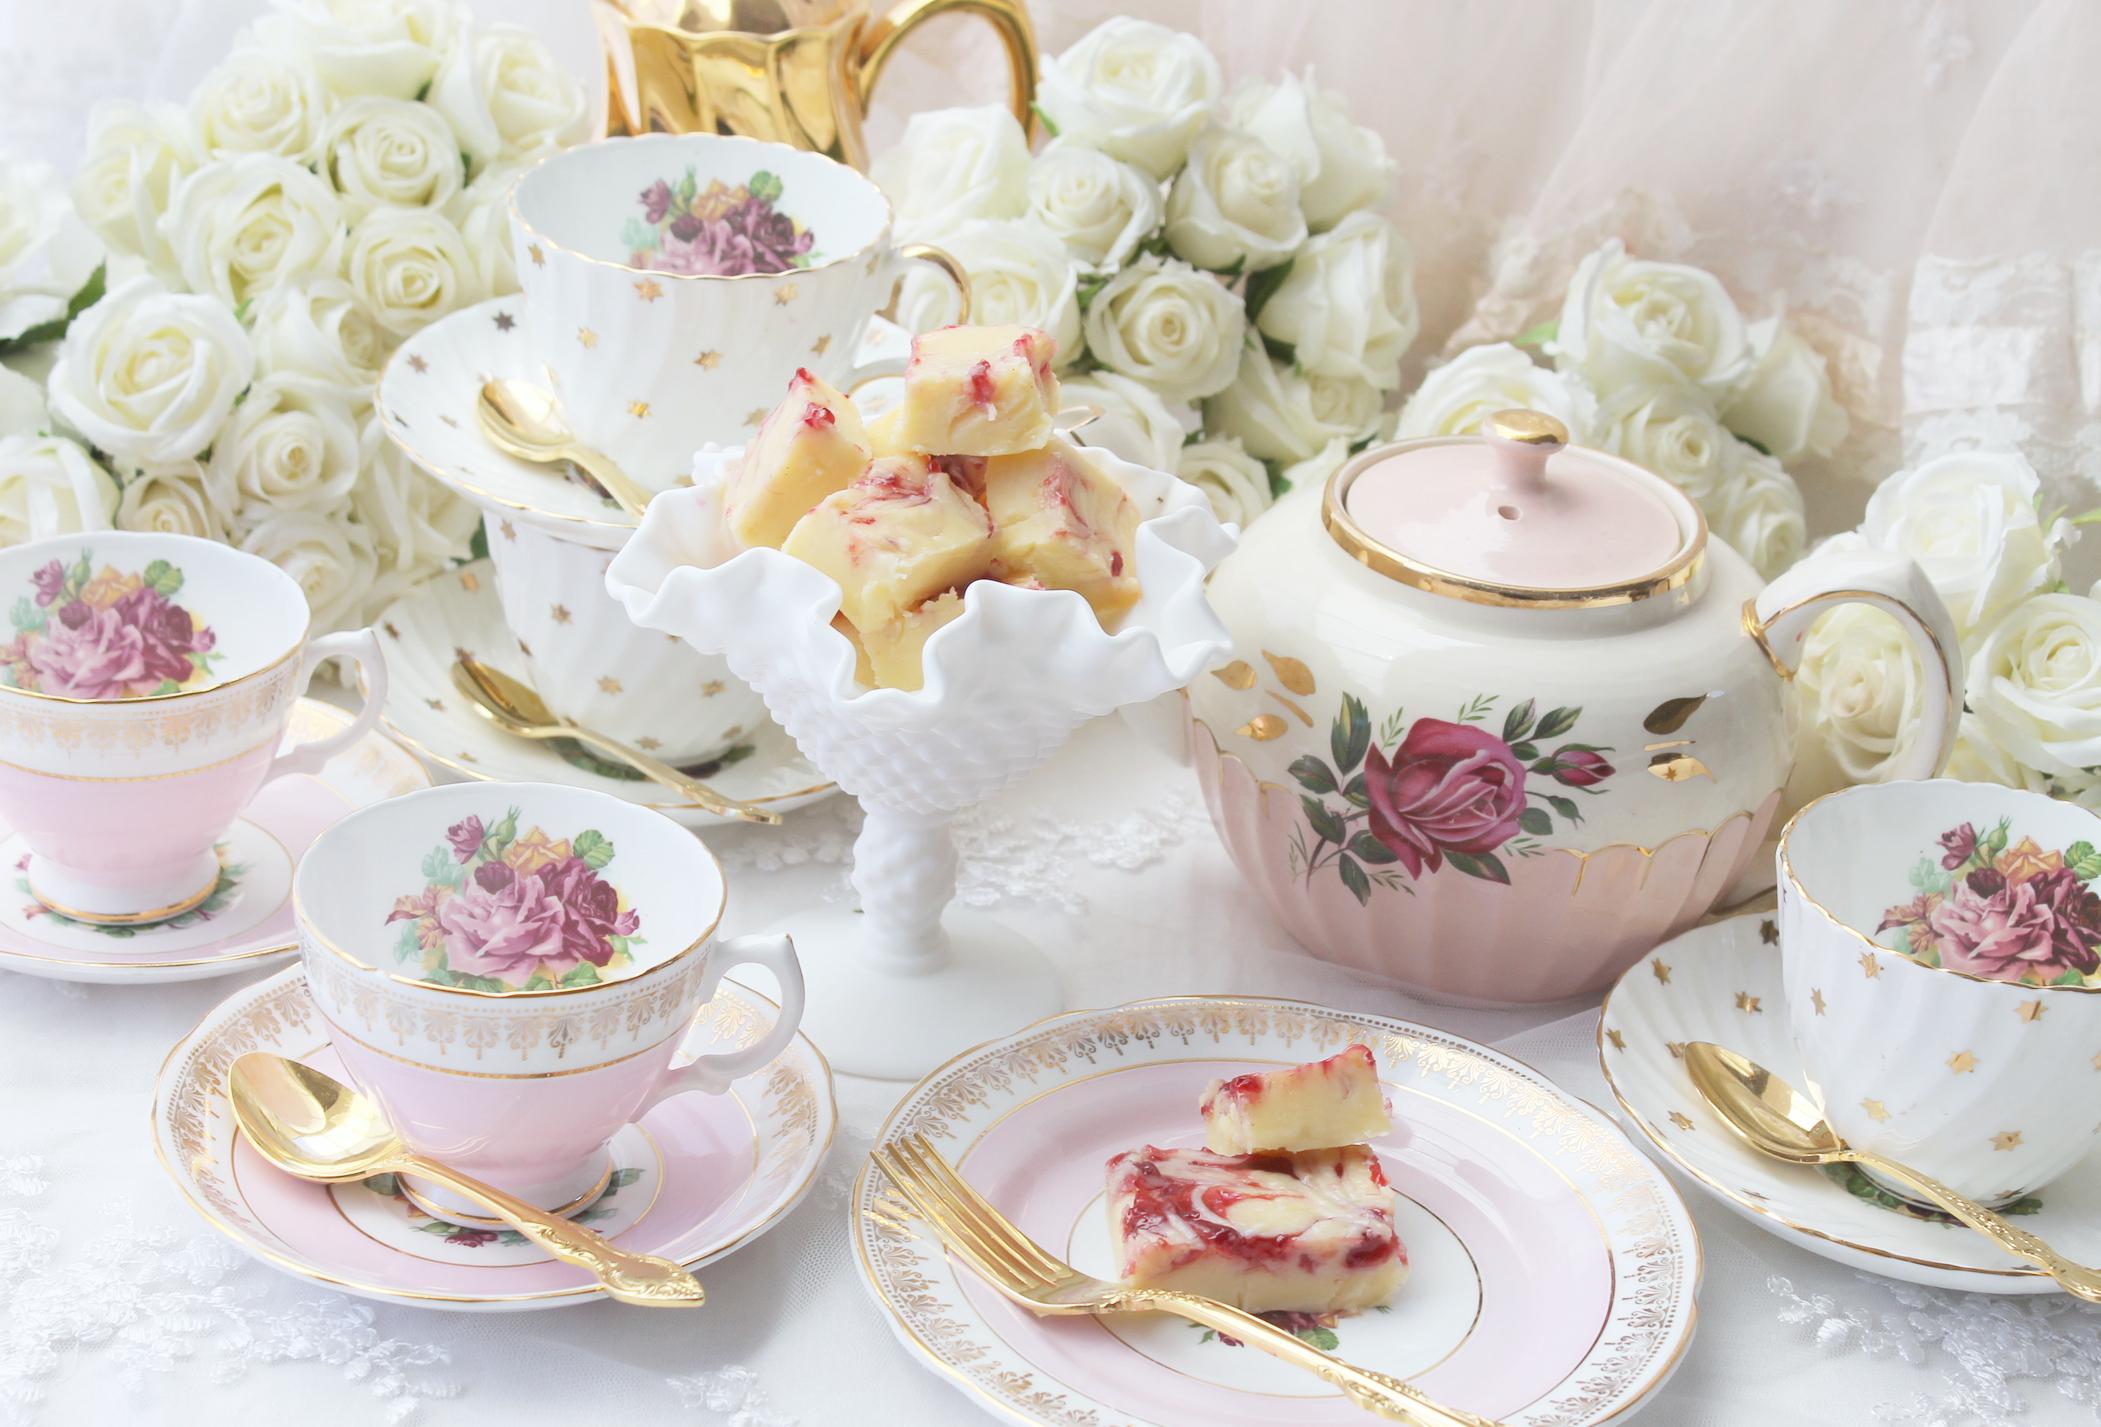 Bridal Shower Plates | LoveToKnow